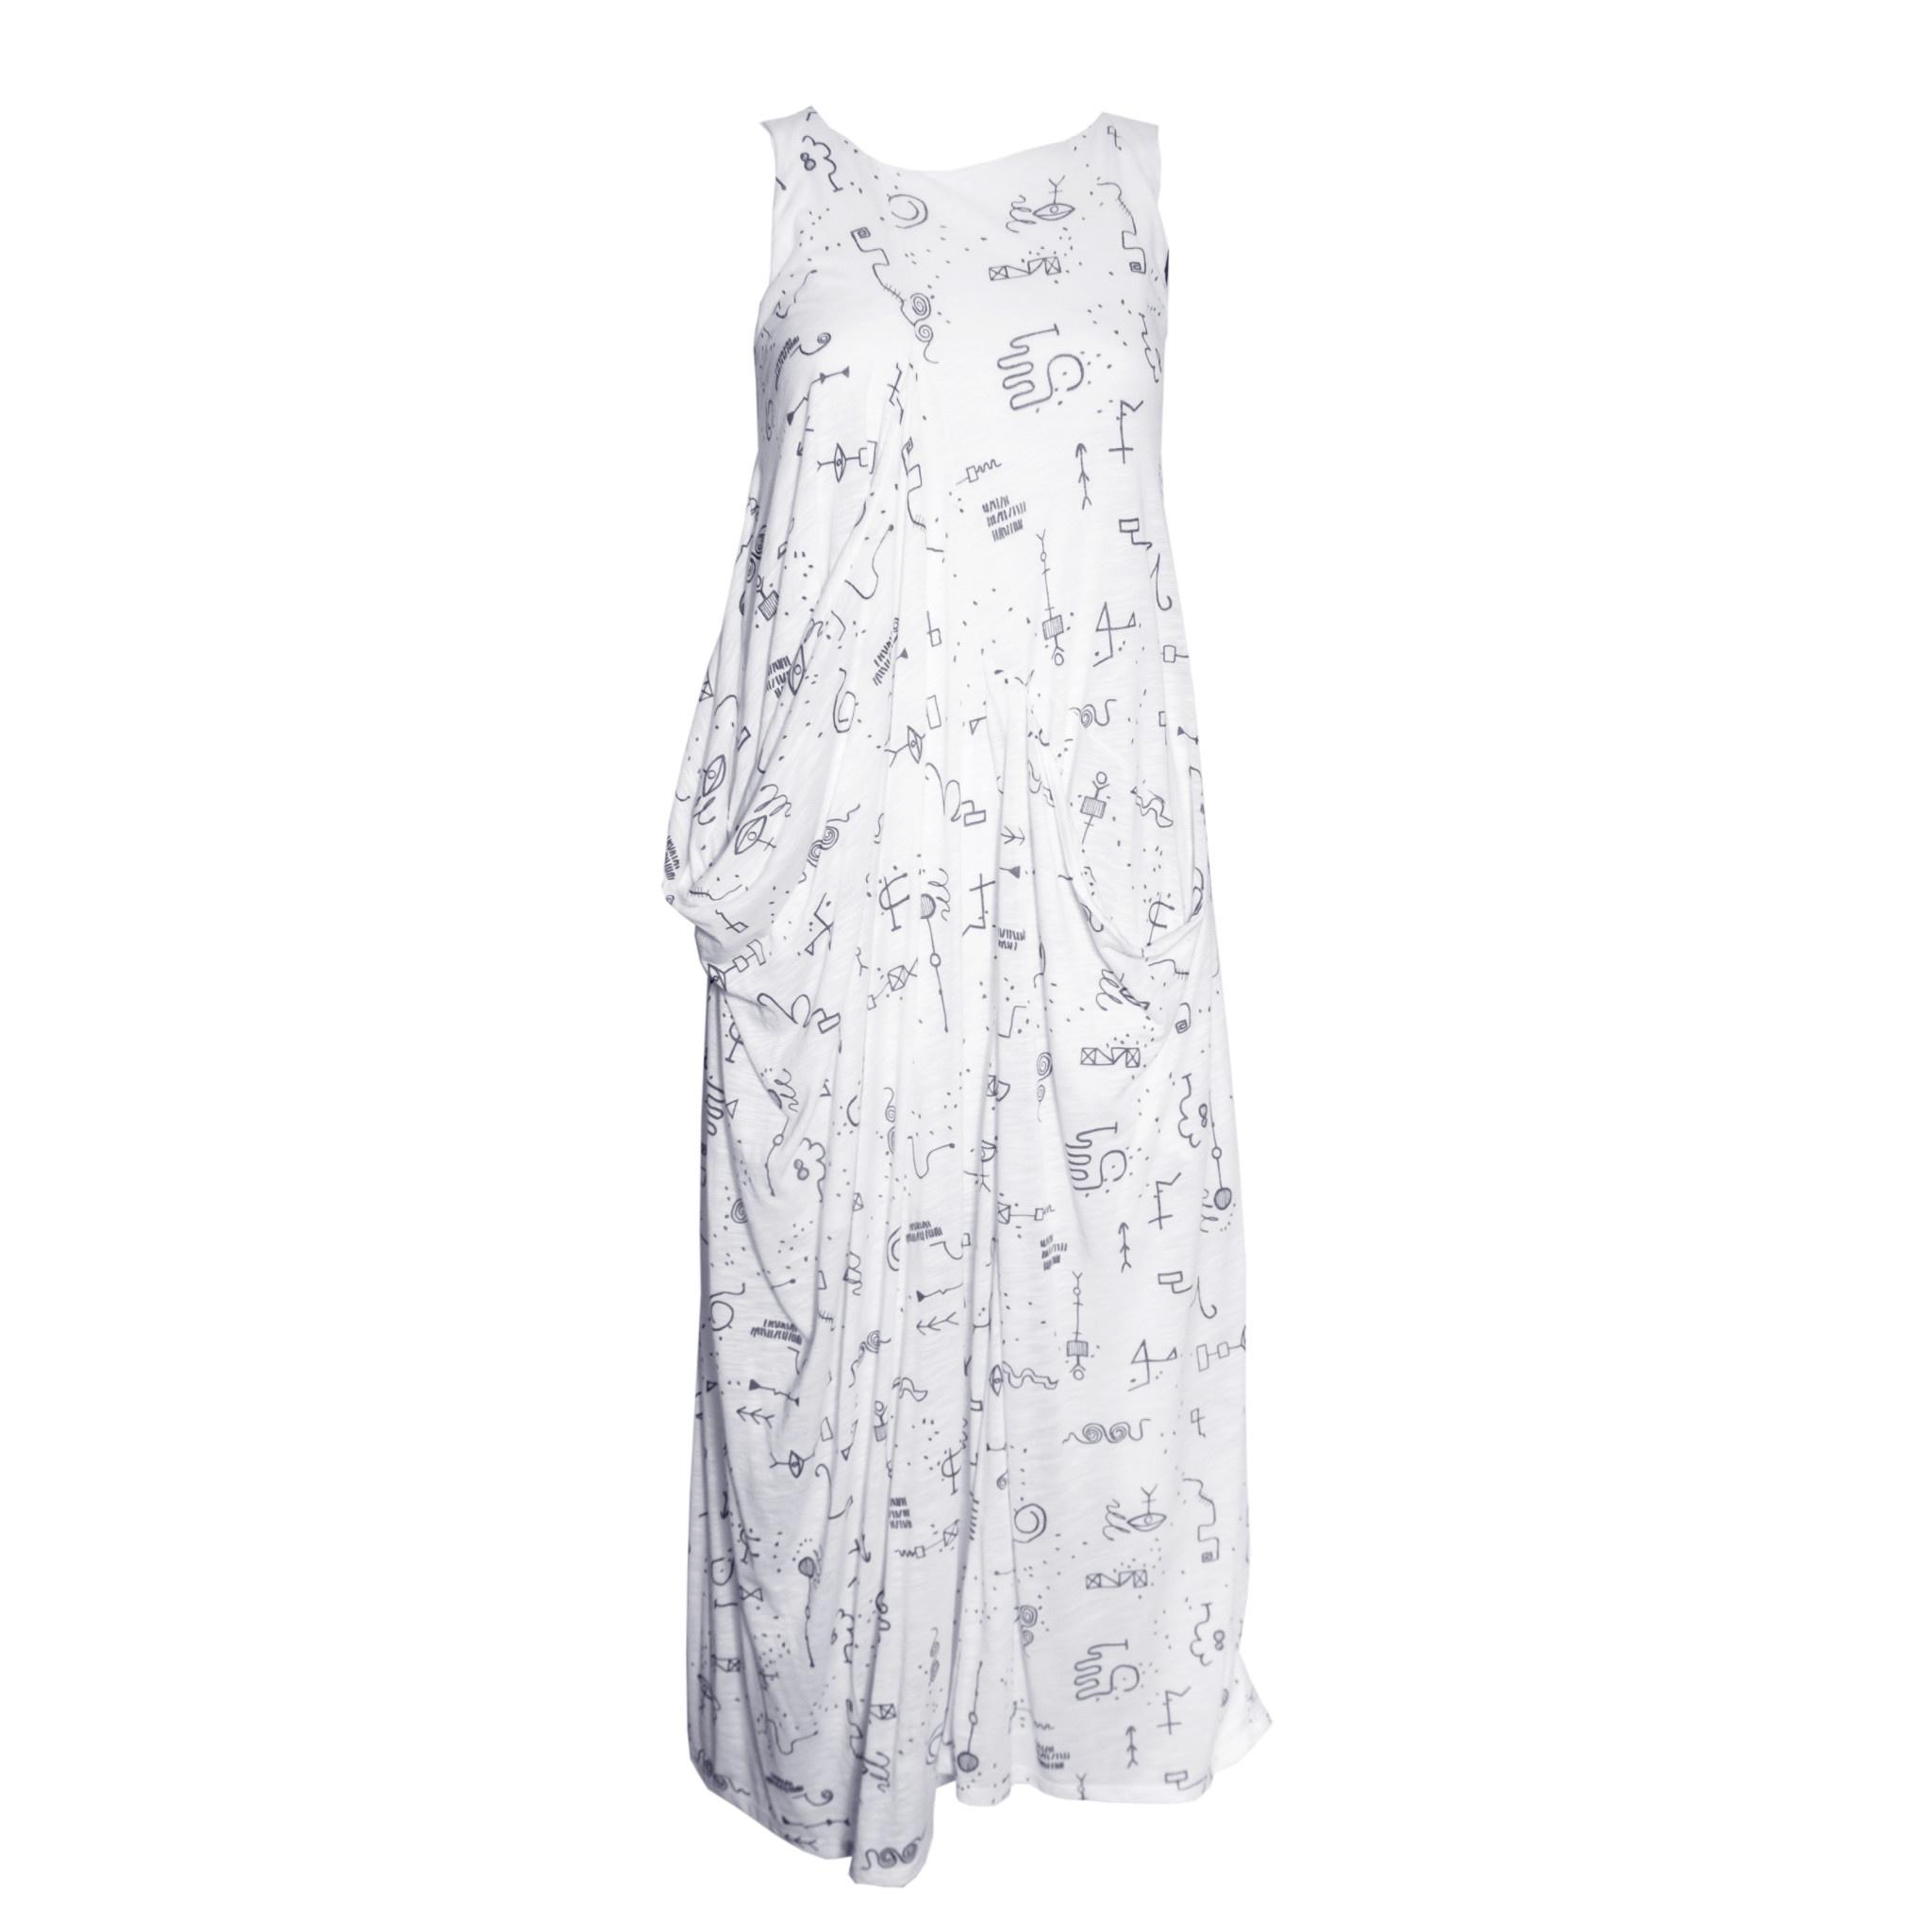 Matthildur Matthildur Flame Pocket Dress - Tattoo